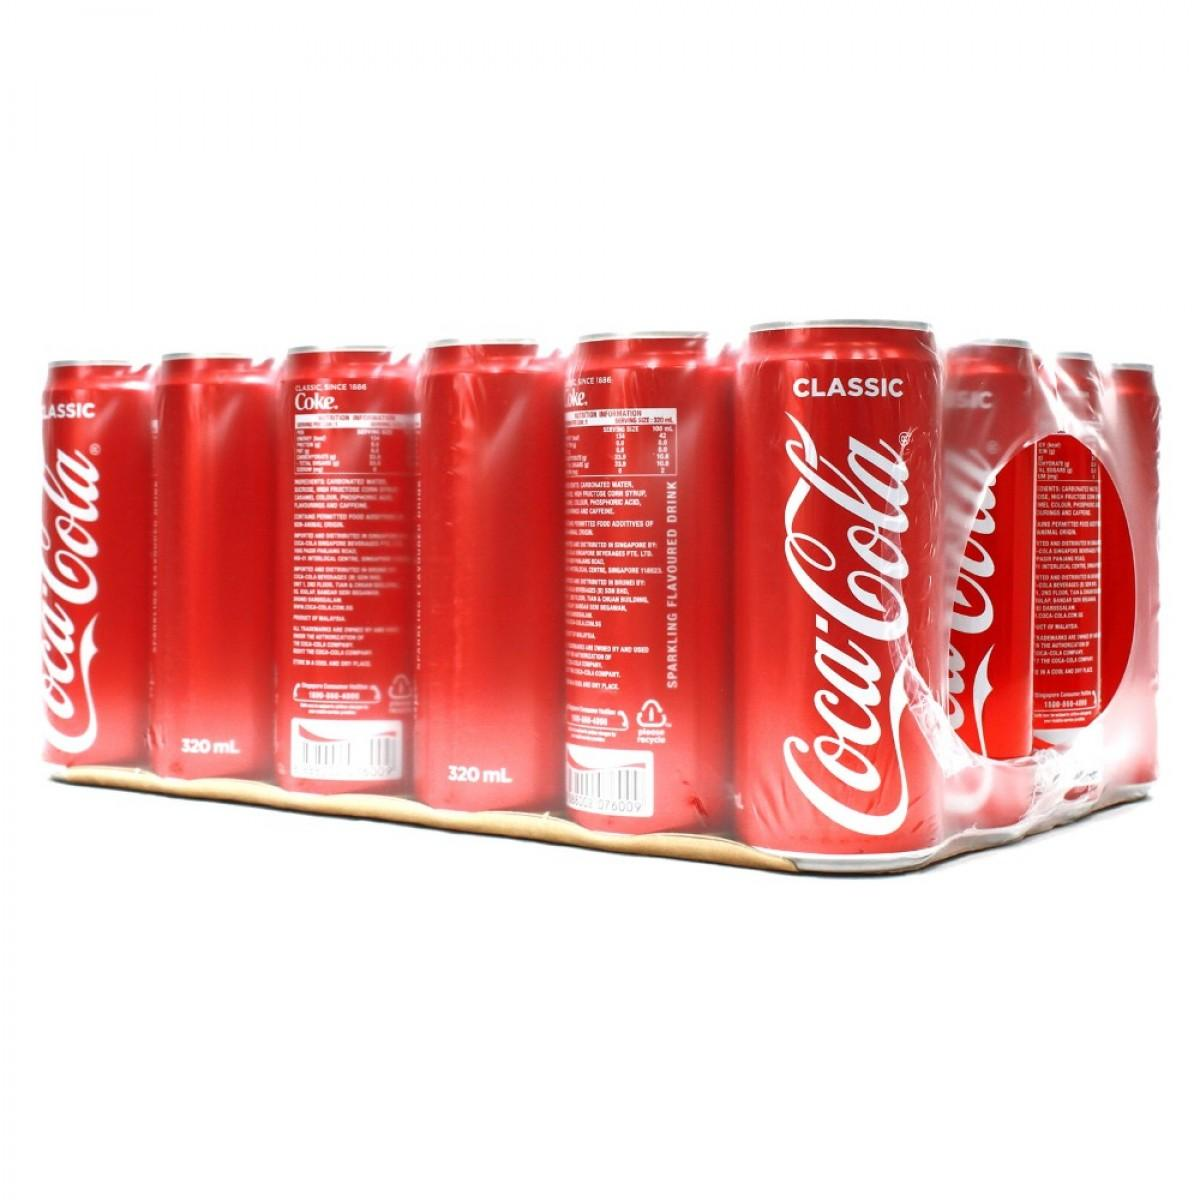 21785294f06b Coca Cola Coke Classic 24X330ml Cans Carton Deal (24X330ml)